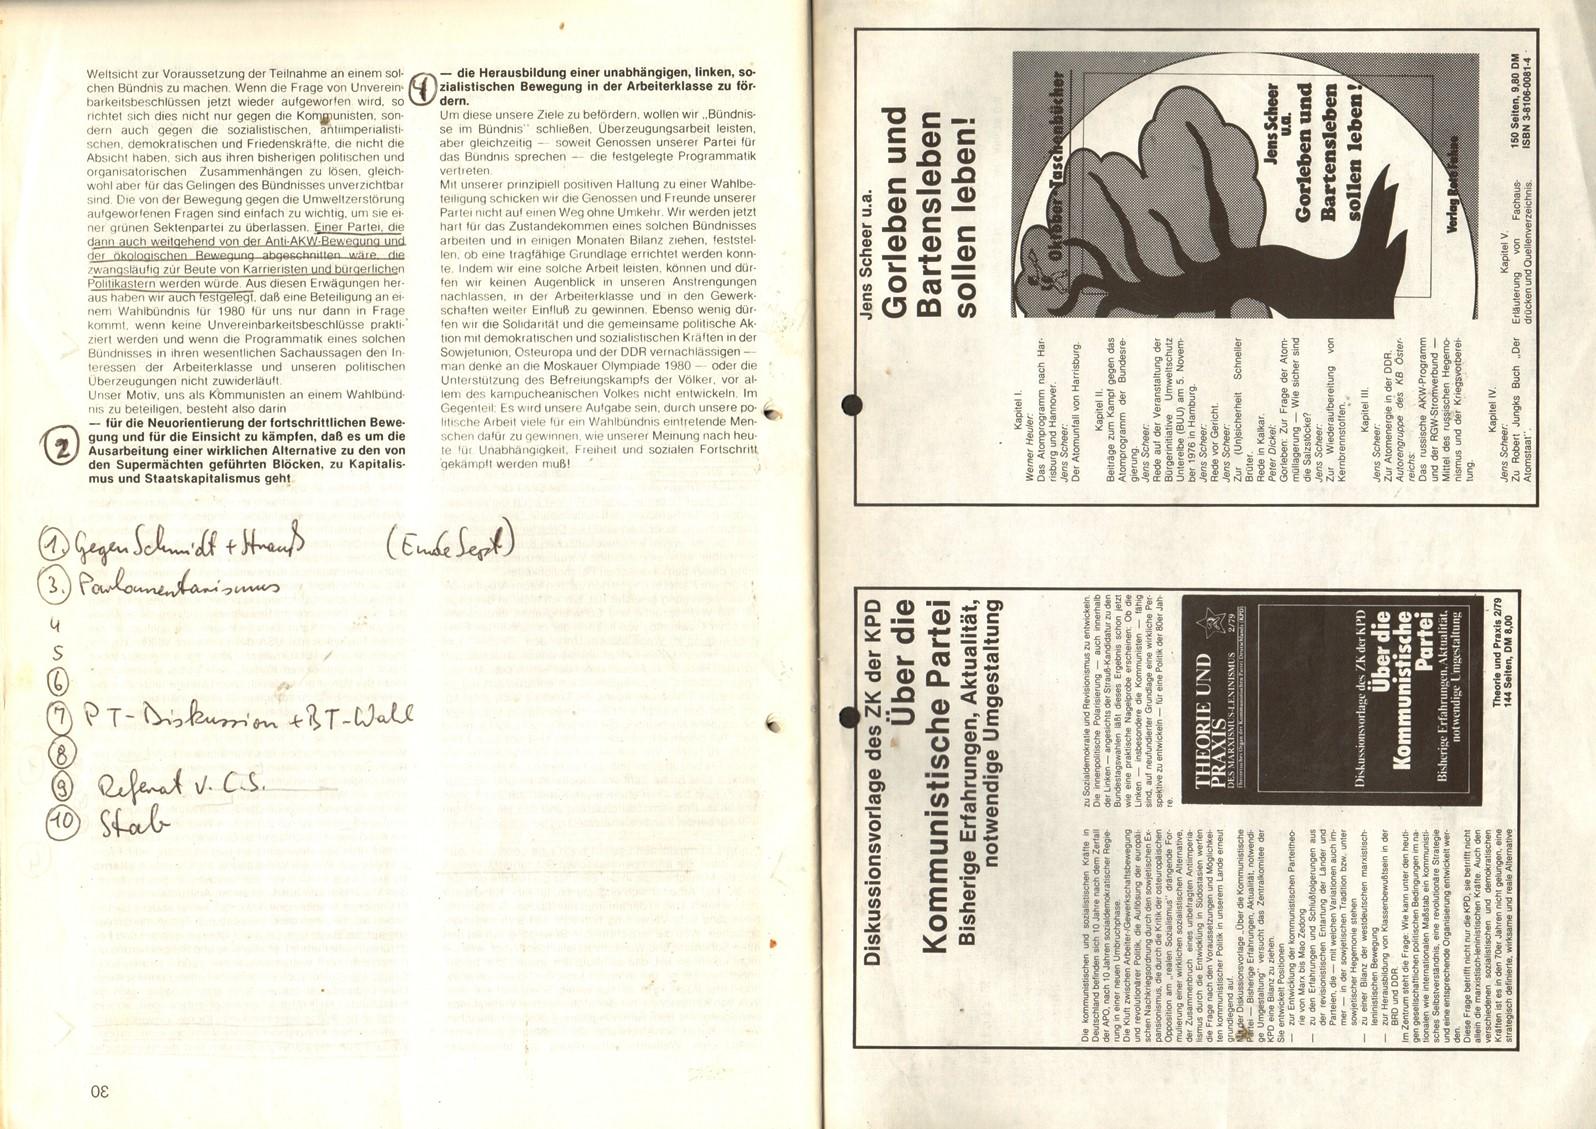 KPDAO_1979_Diskussion_Bundestagswahlen_1980_16